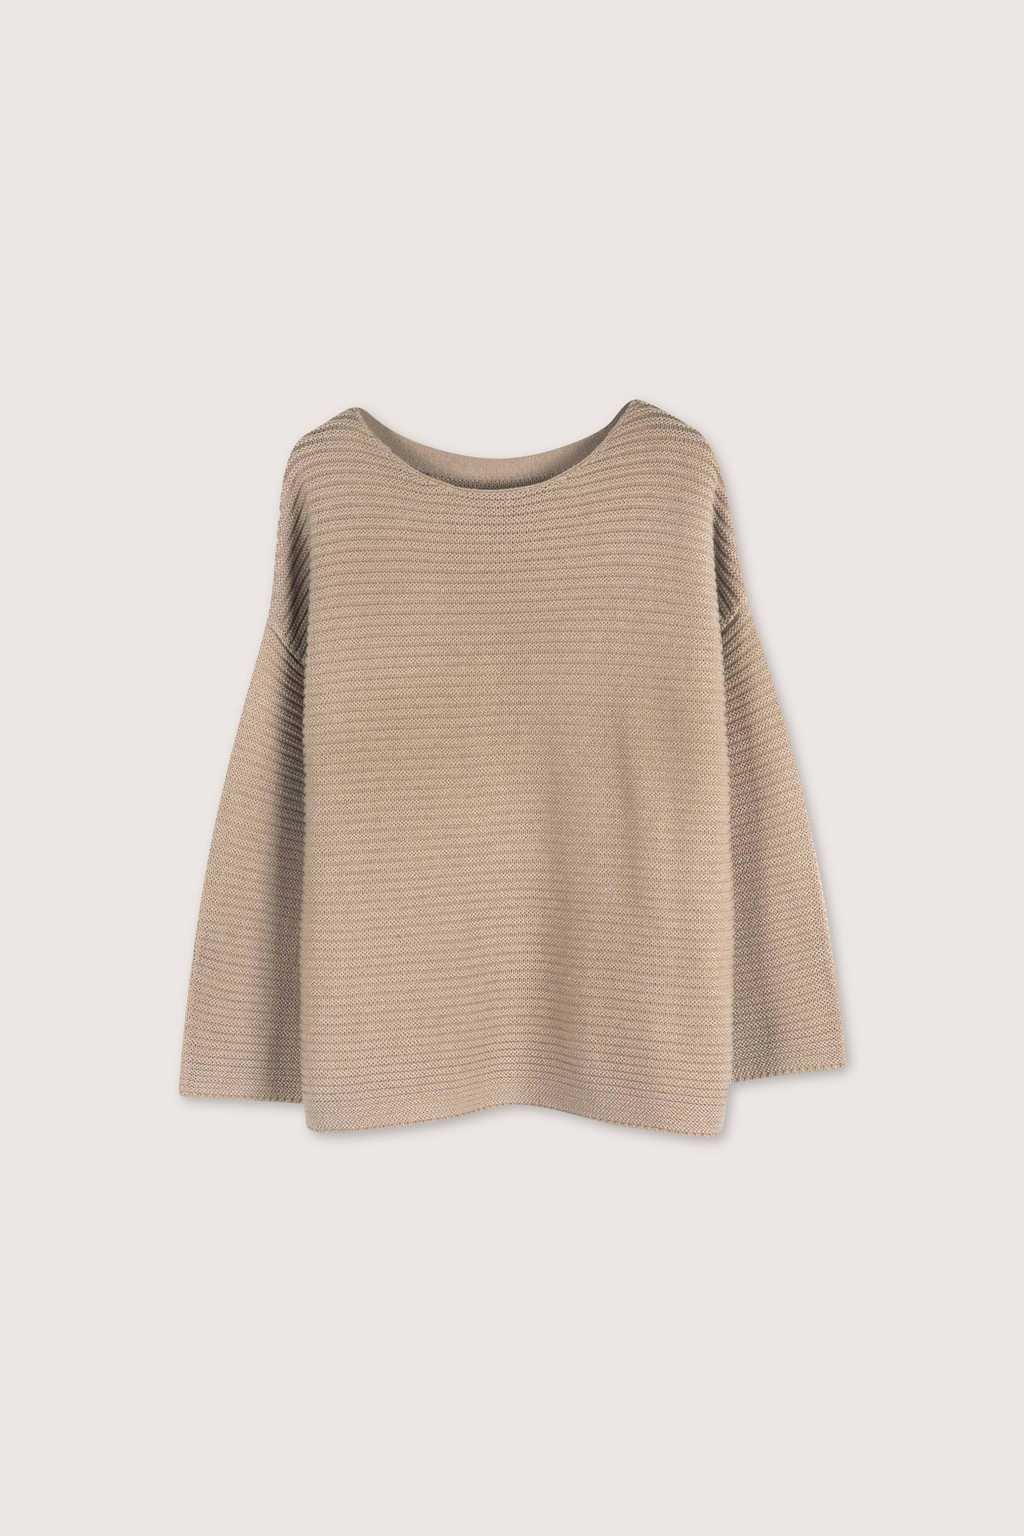 Sweater 1829 Beige 5